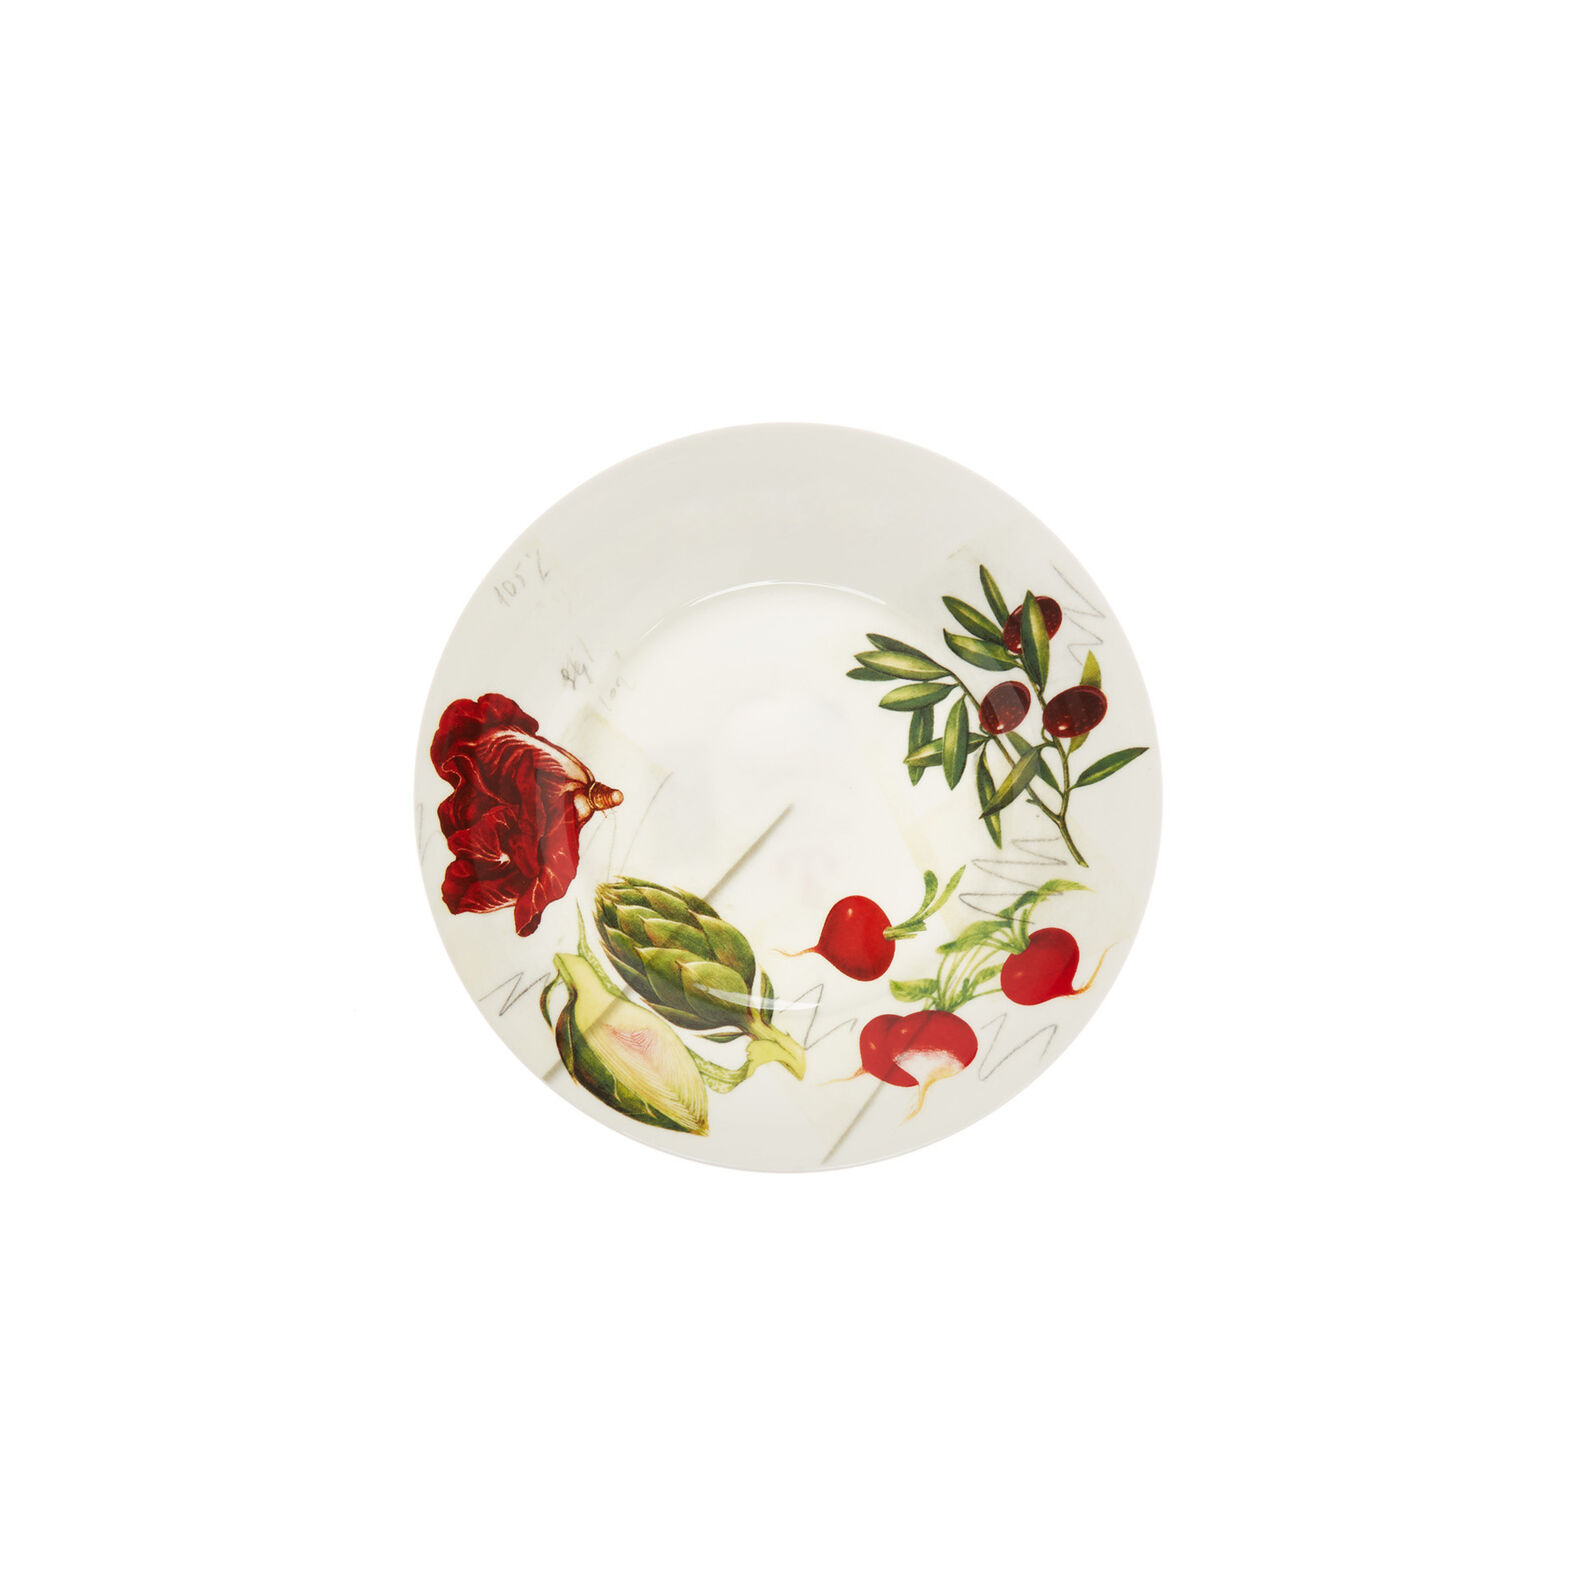 Fine bone china side plate with vegan La Cucina Italiana decoration